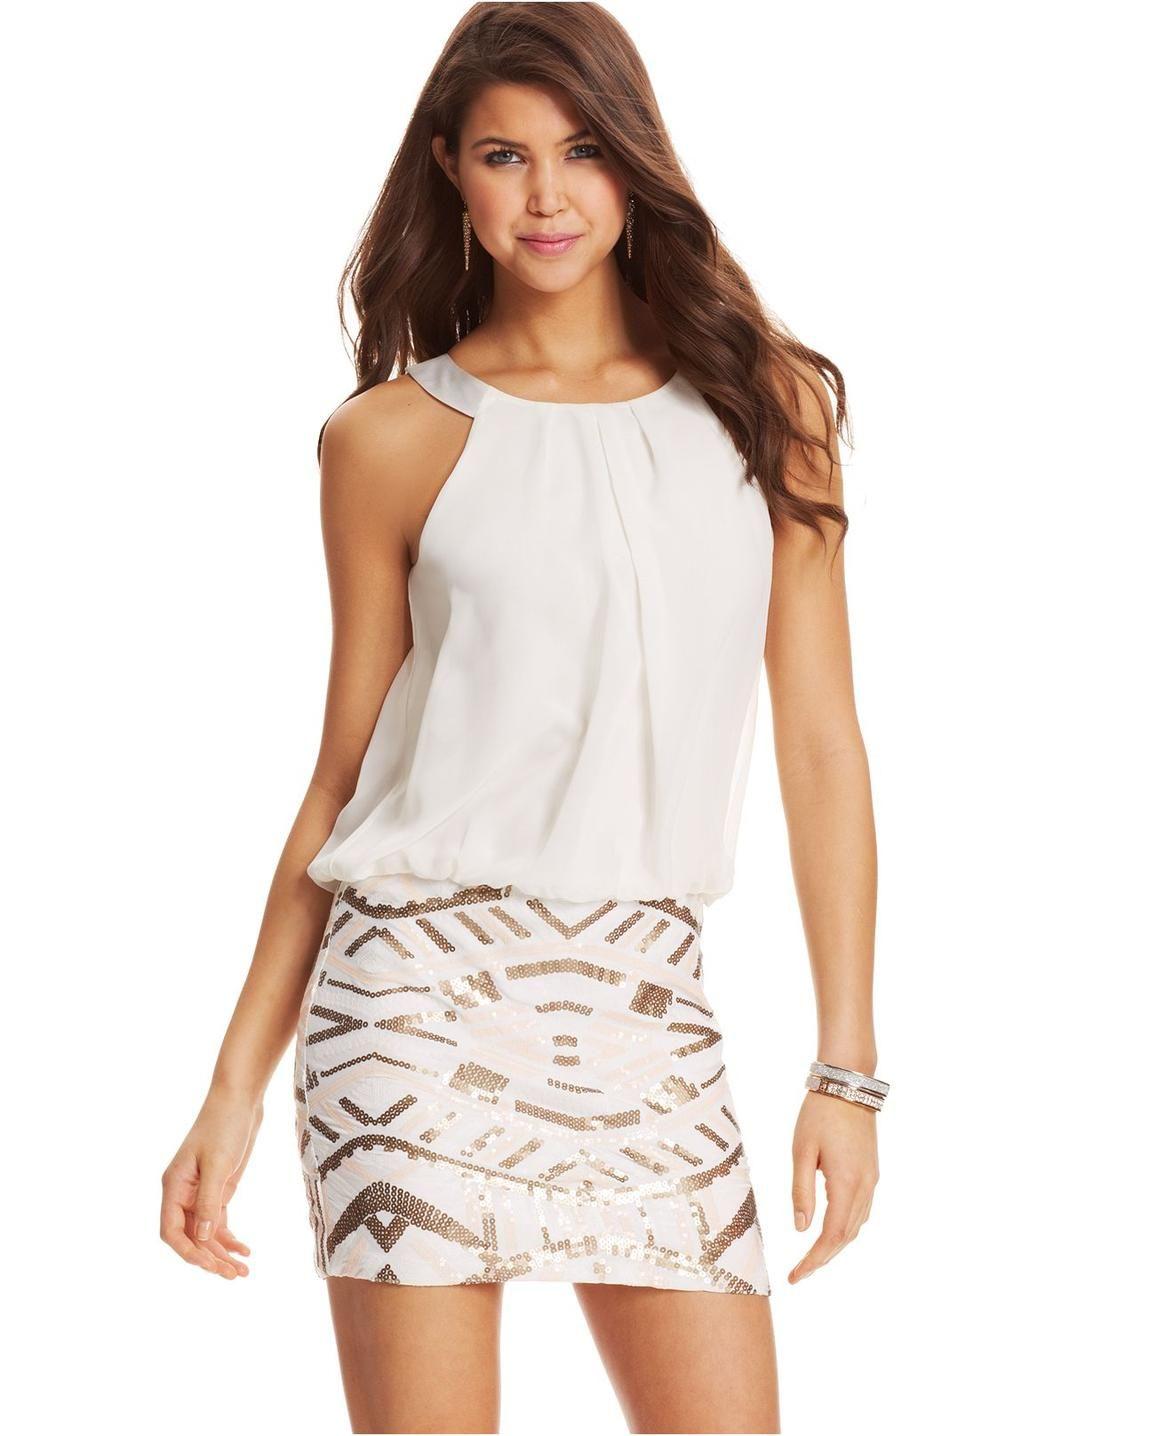 As U Wish Juniors' Sequin Blouson Dress http://picvpic.com/women ...